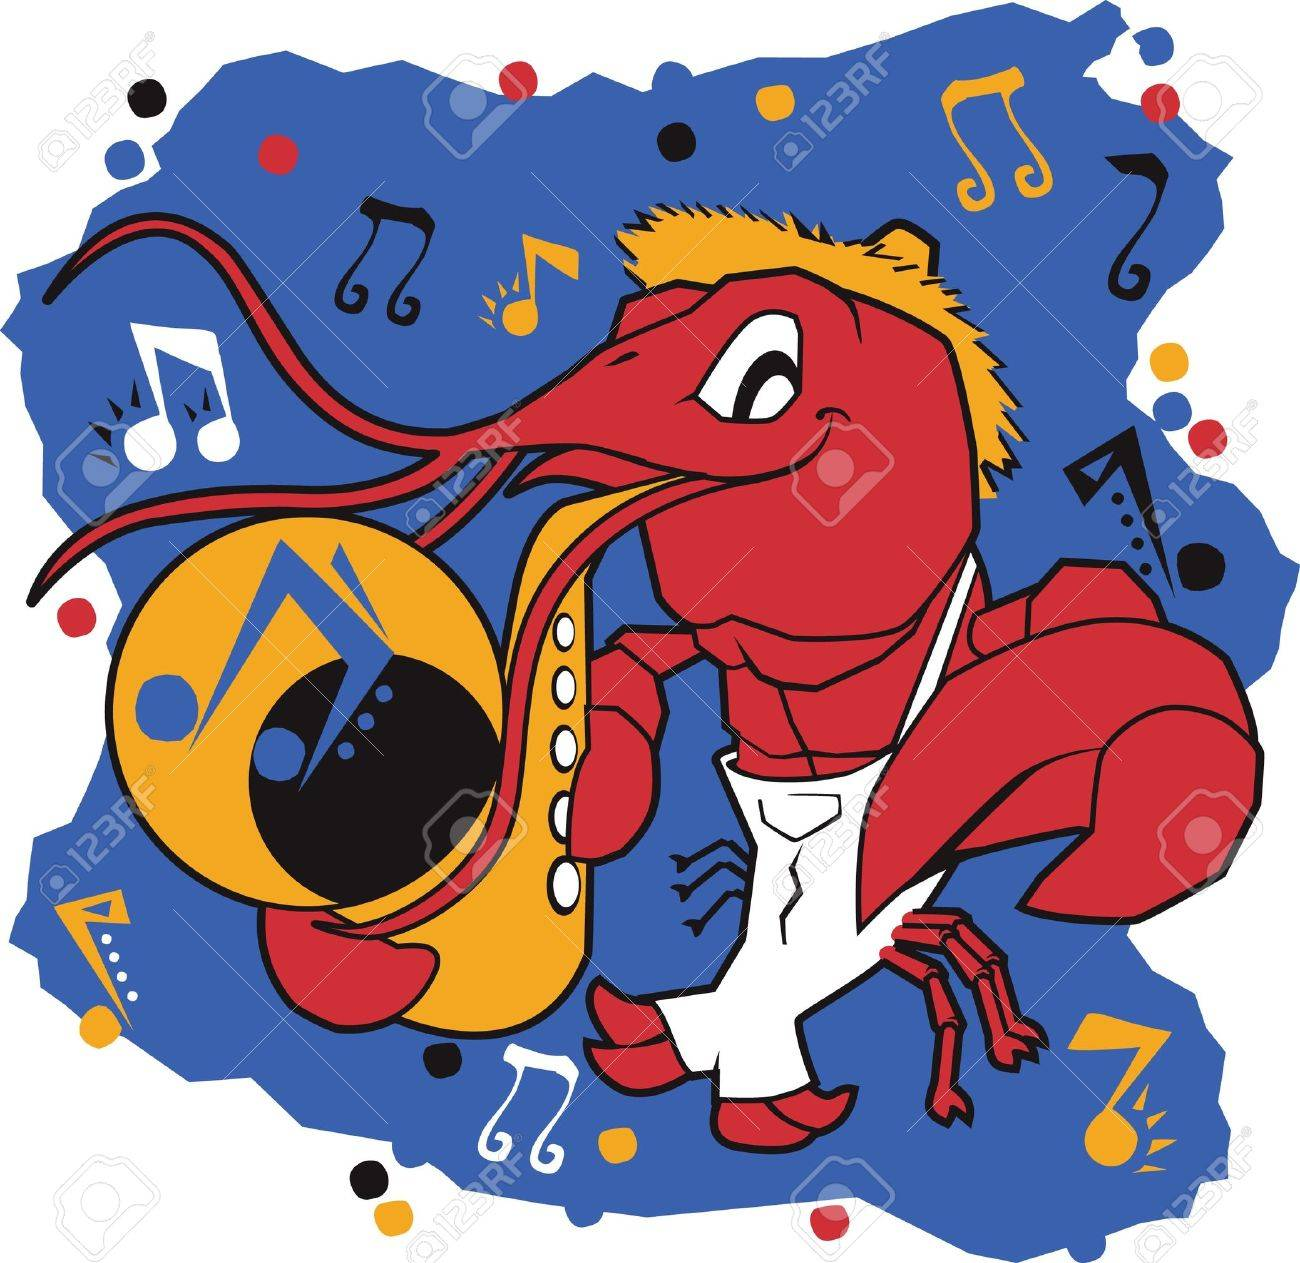 Musical Mudbug Stock Vector - 13453550